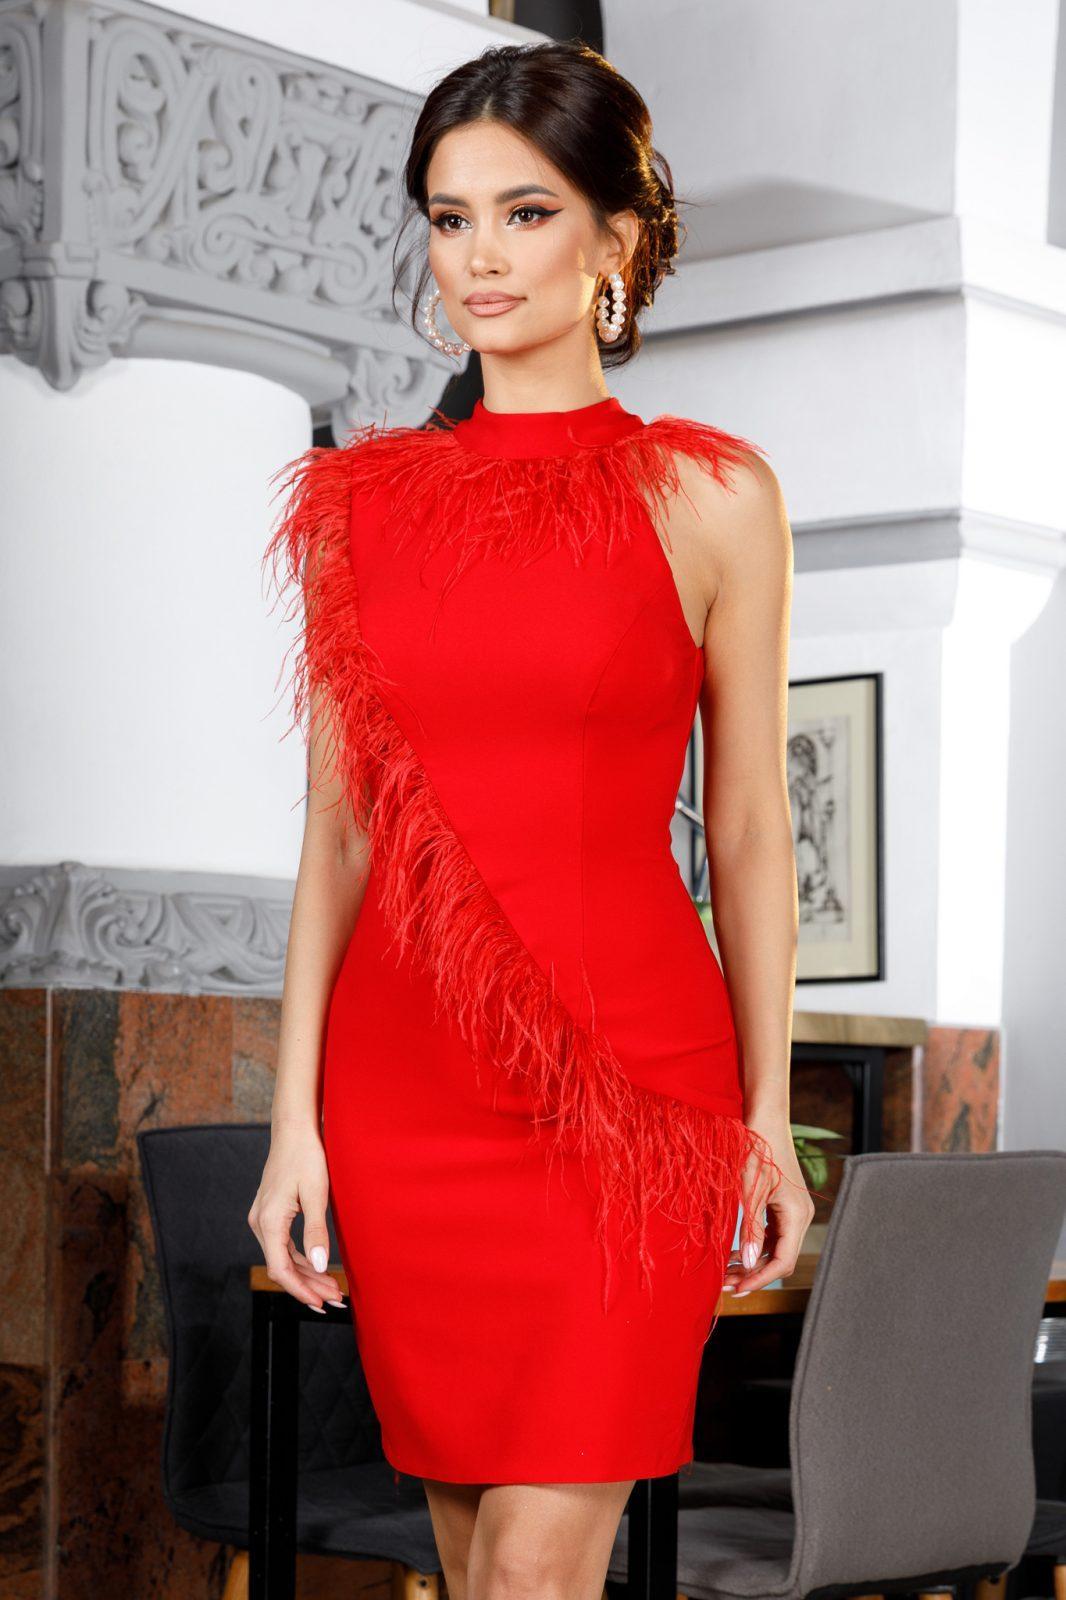 Janine Red Dress